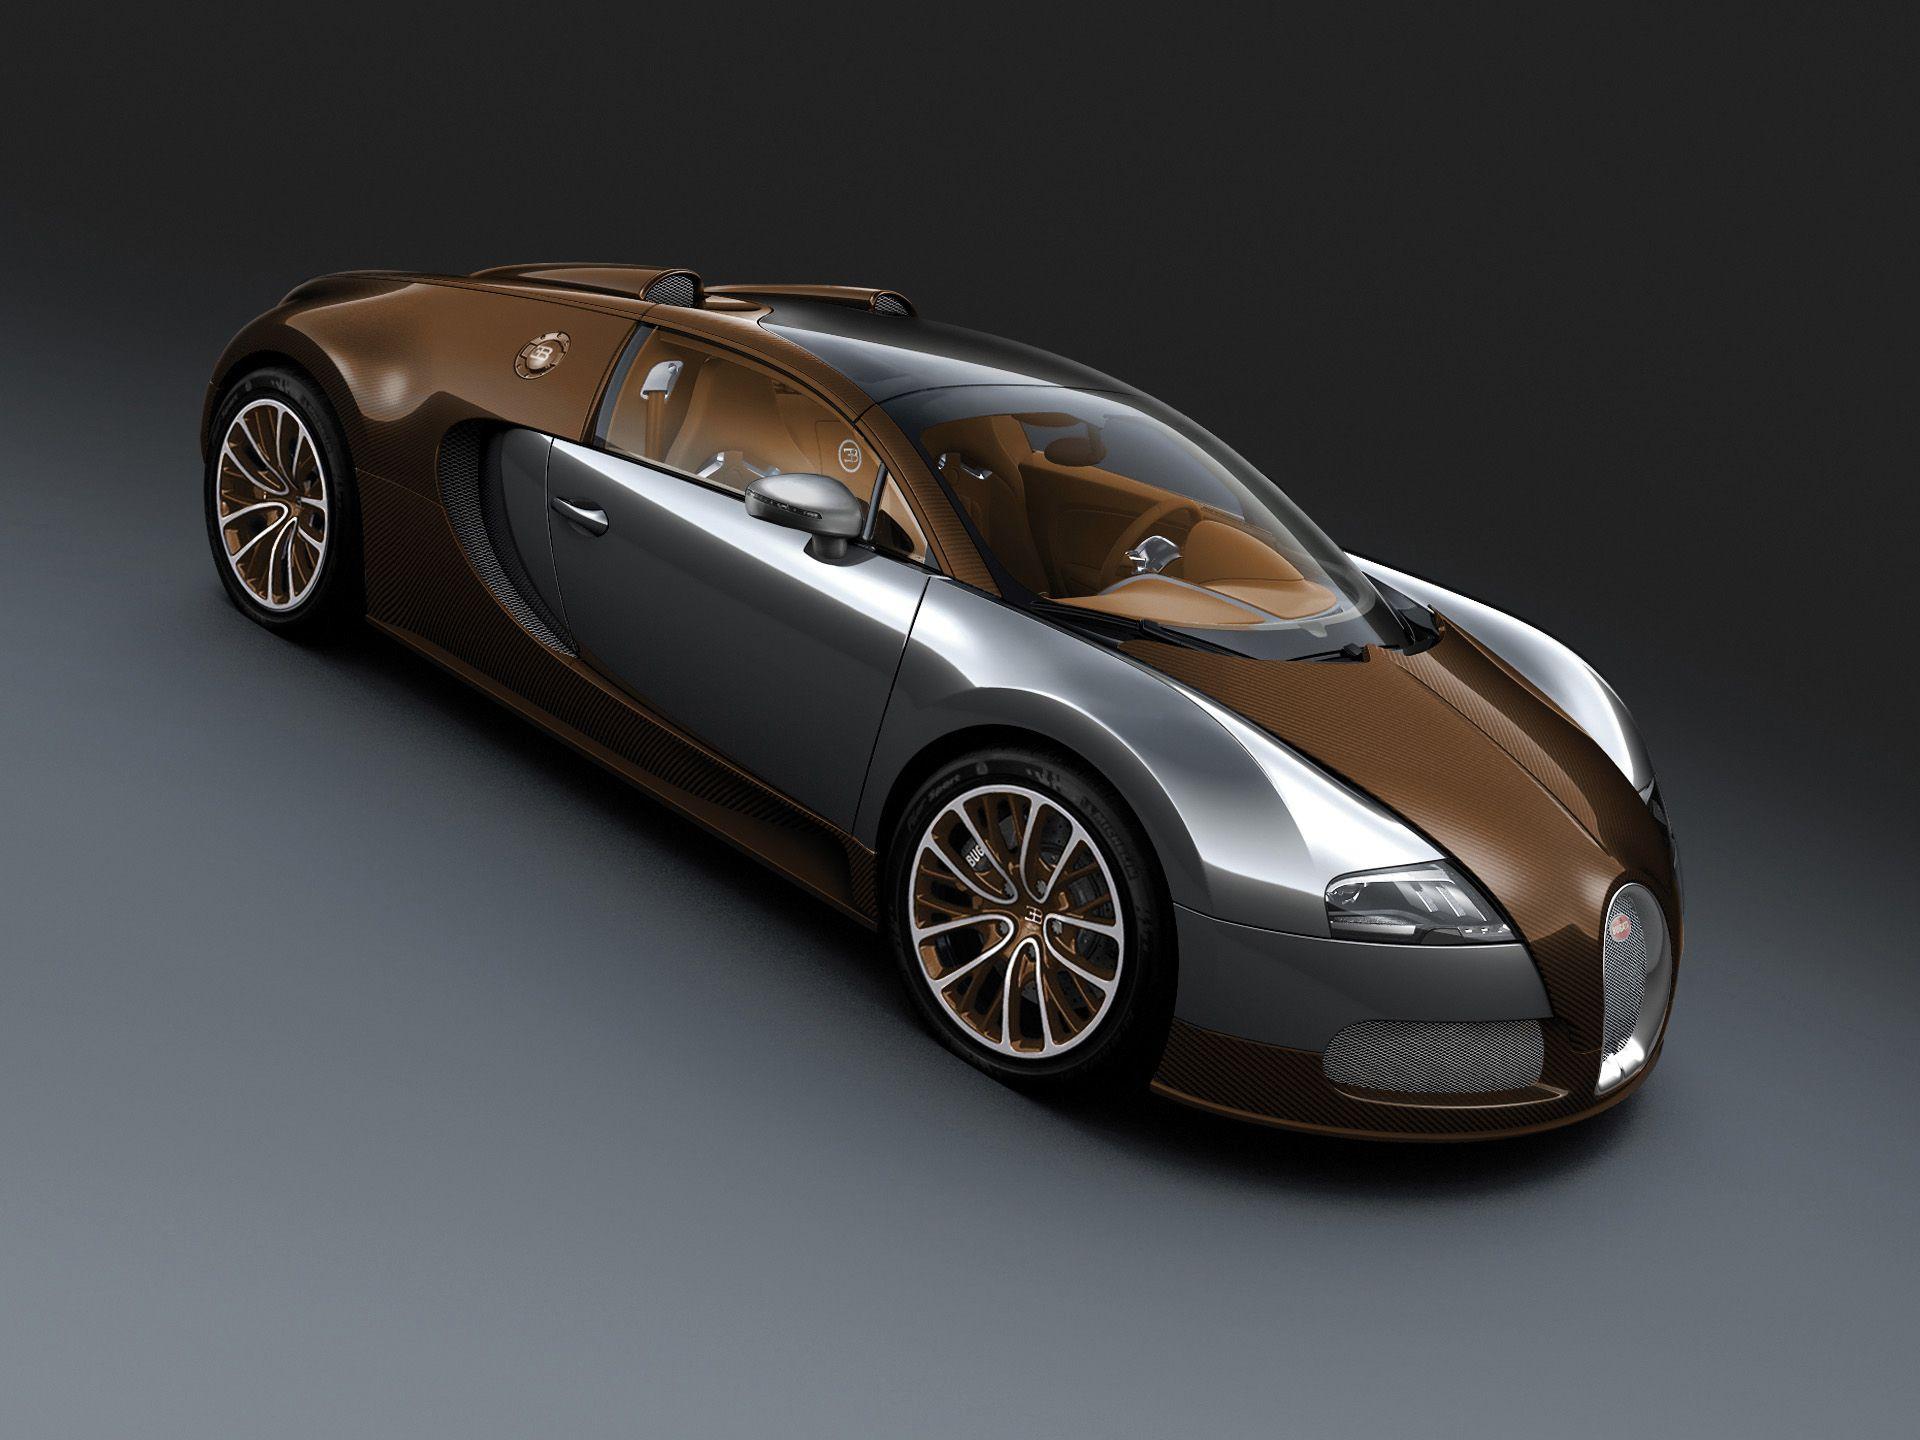 d1563973a135d8cc7b0ec35ac31d5012 Terrific Bugatti Veyron 16.4 Grand Sport Vitesse Prix Cars Trend